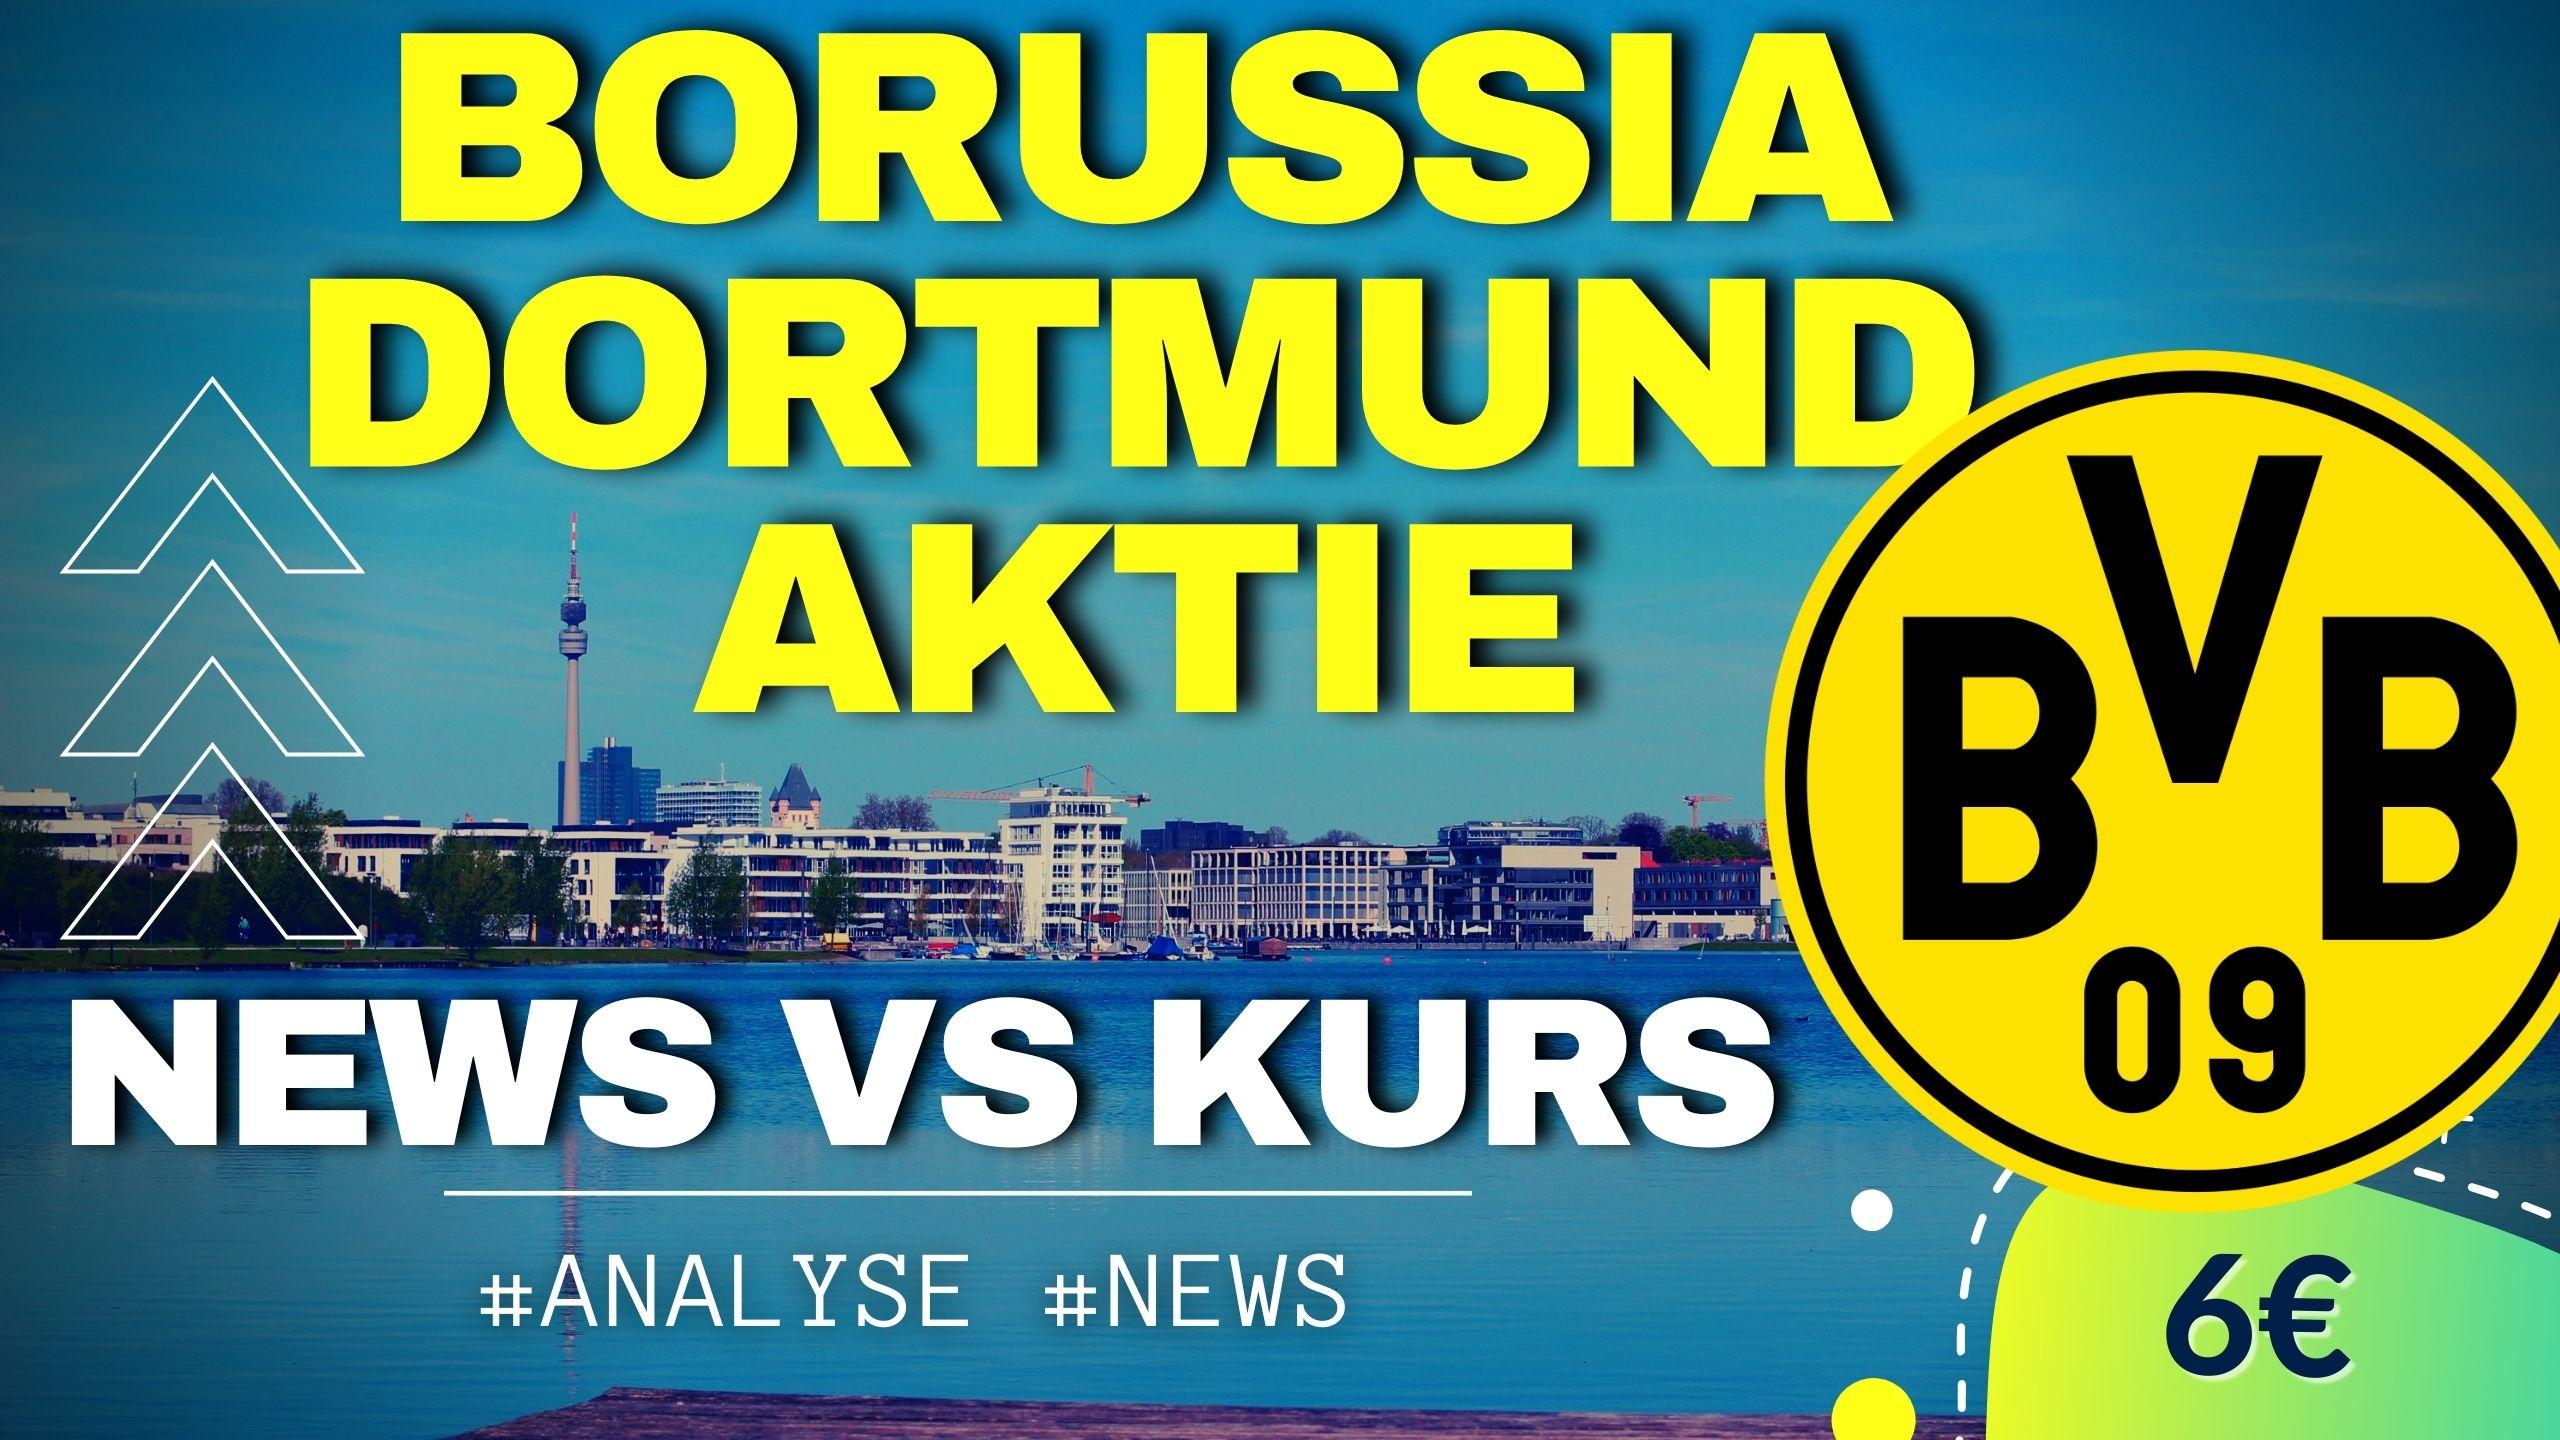 Borussia Dortmund Aktie - Chartanalyse & News